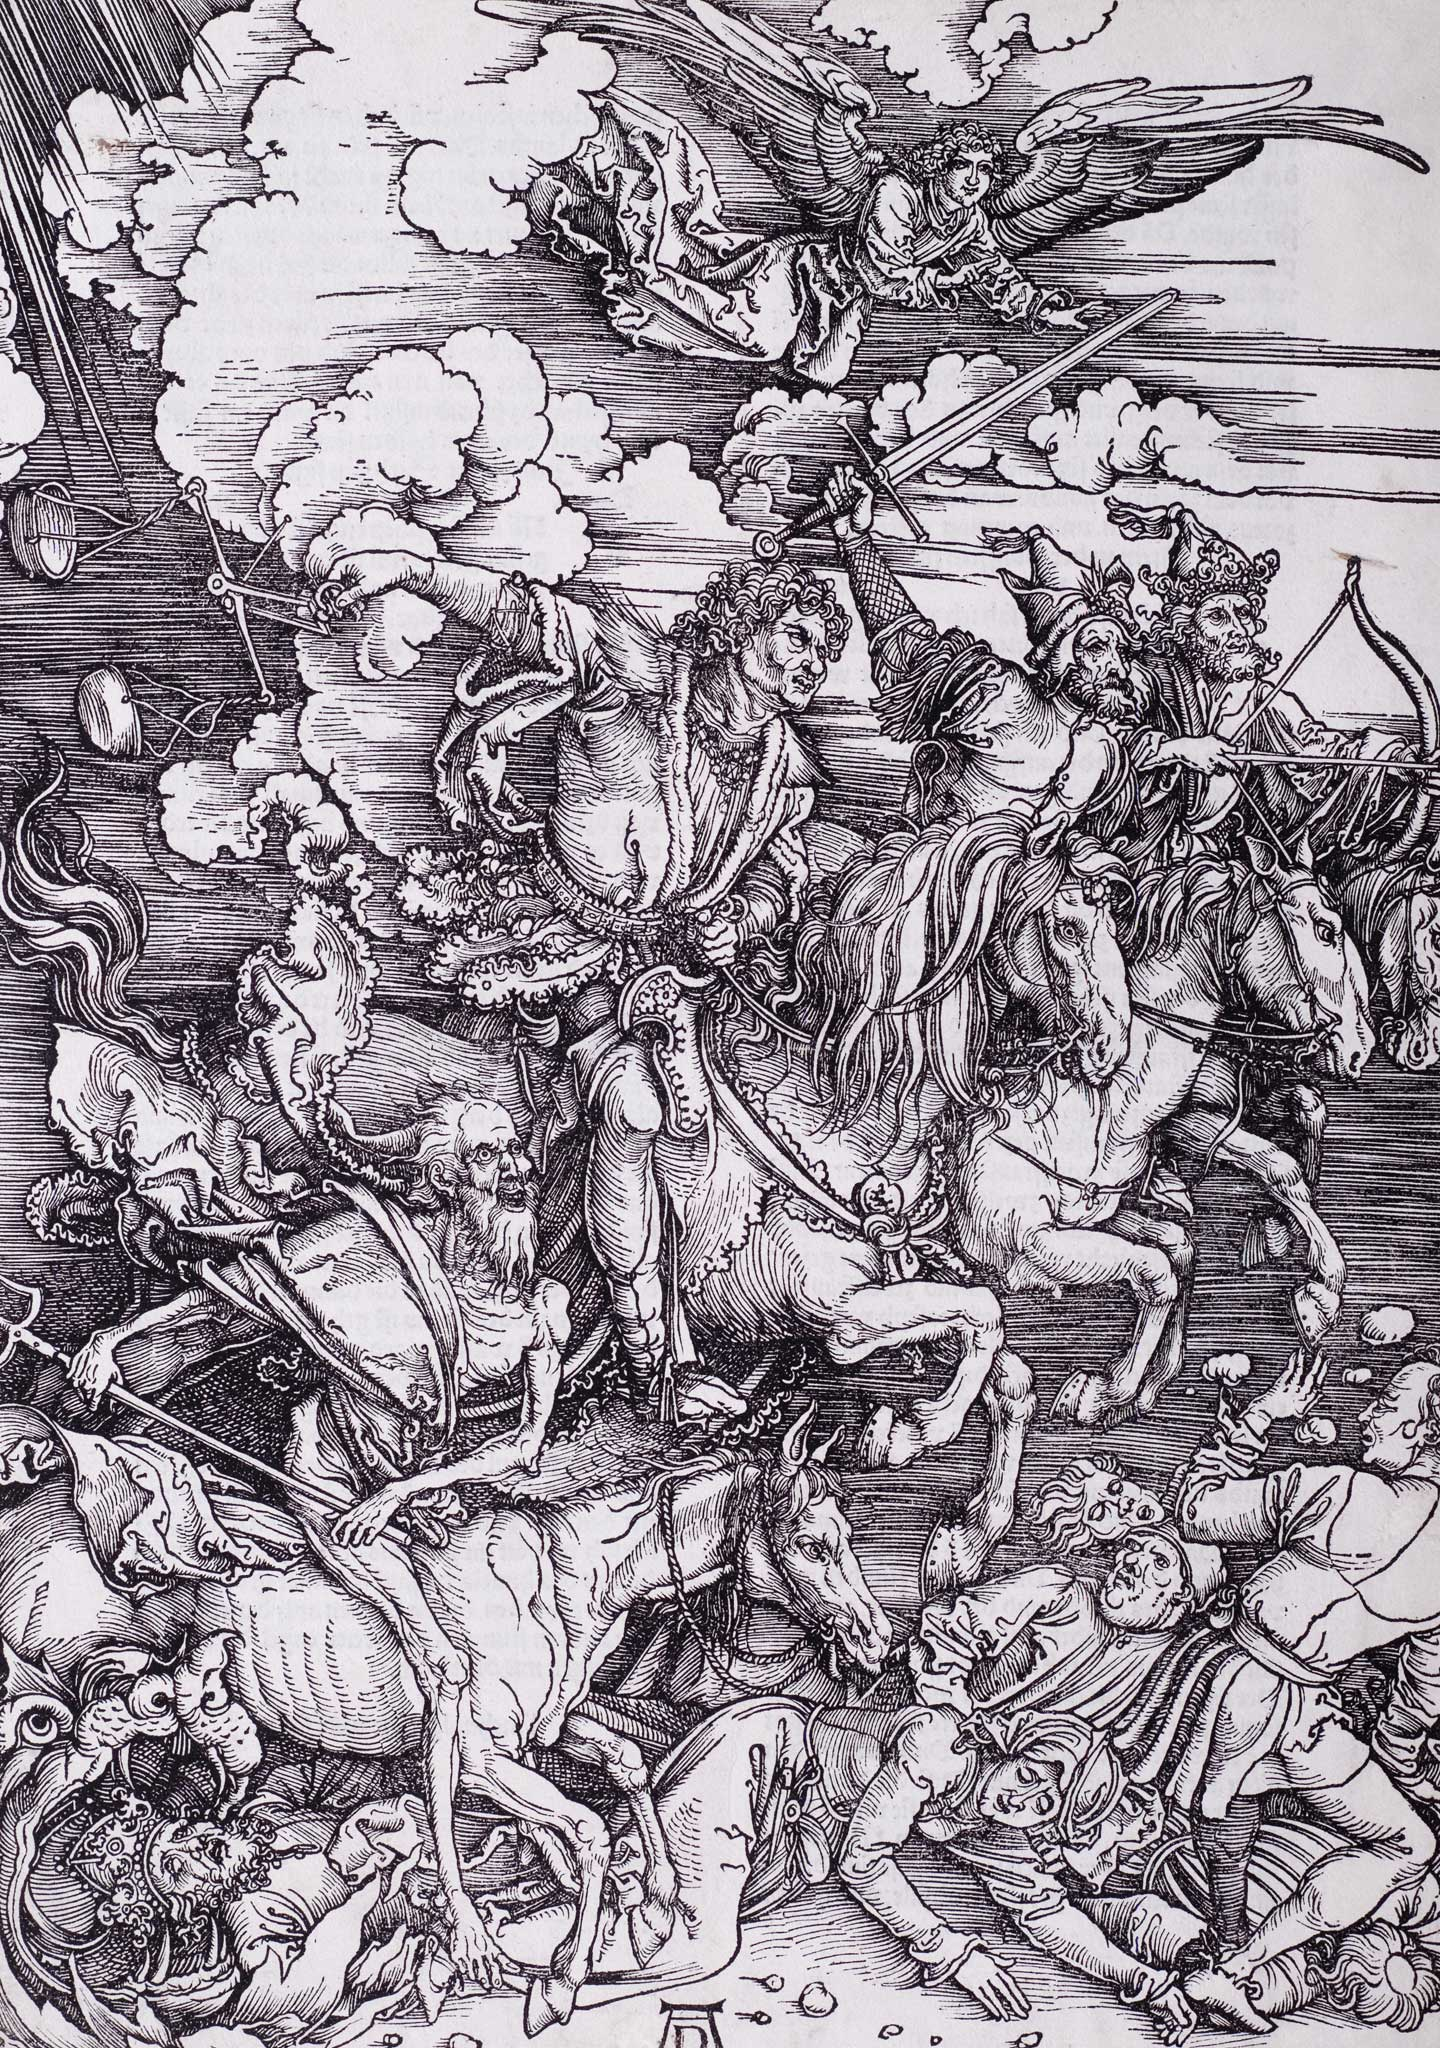 The Four Horsemen of the Apocalypse, Albrecht Dürer